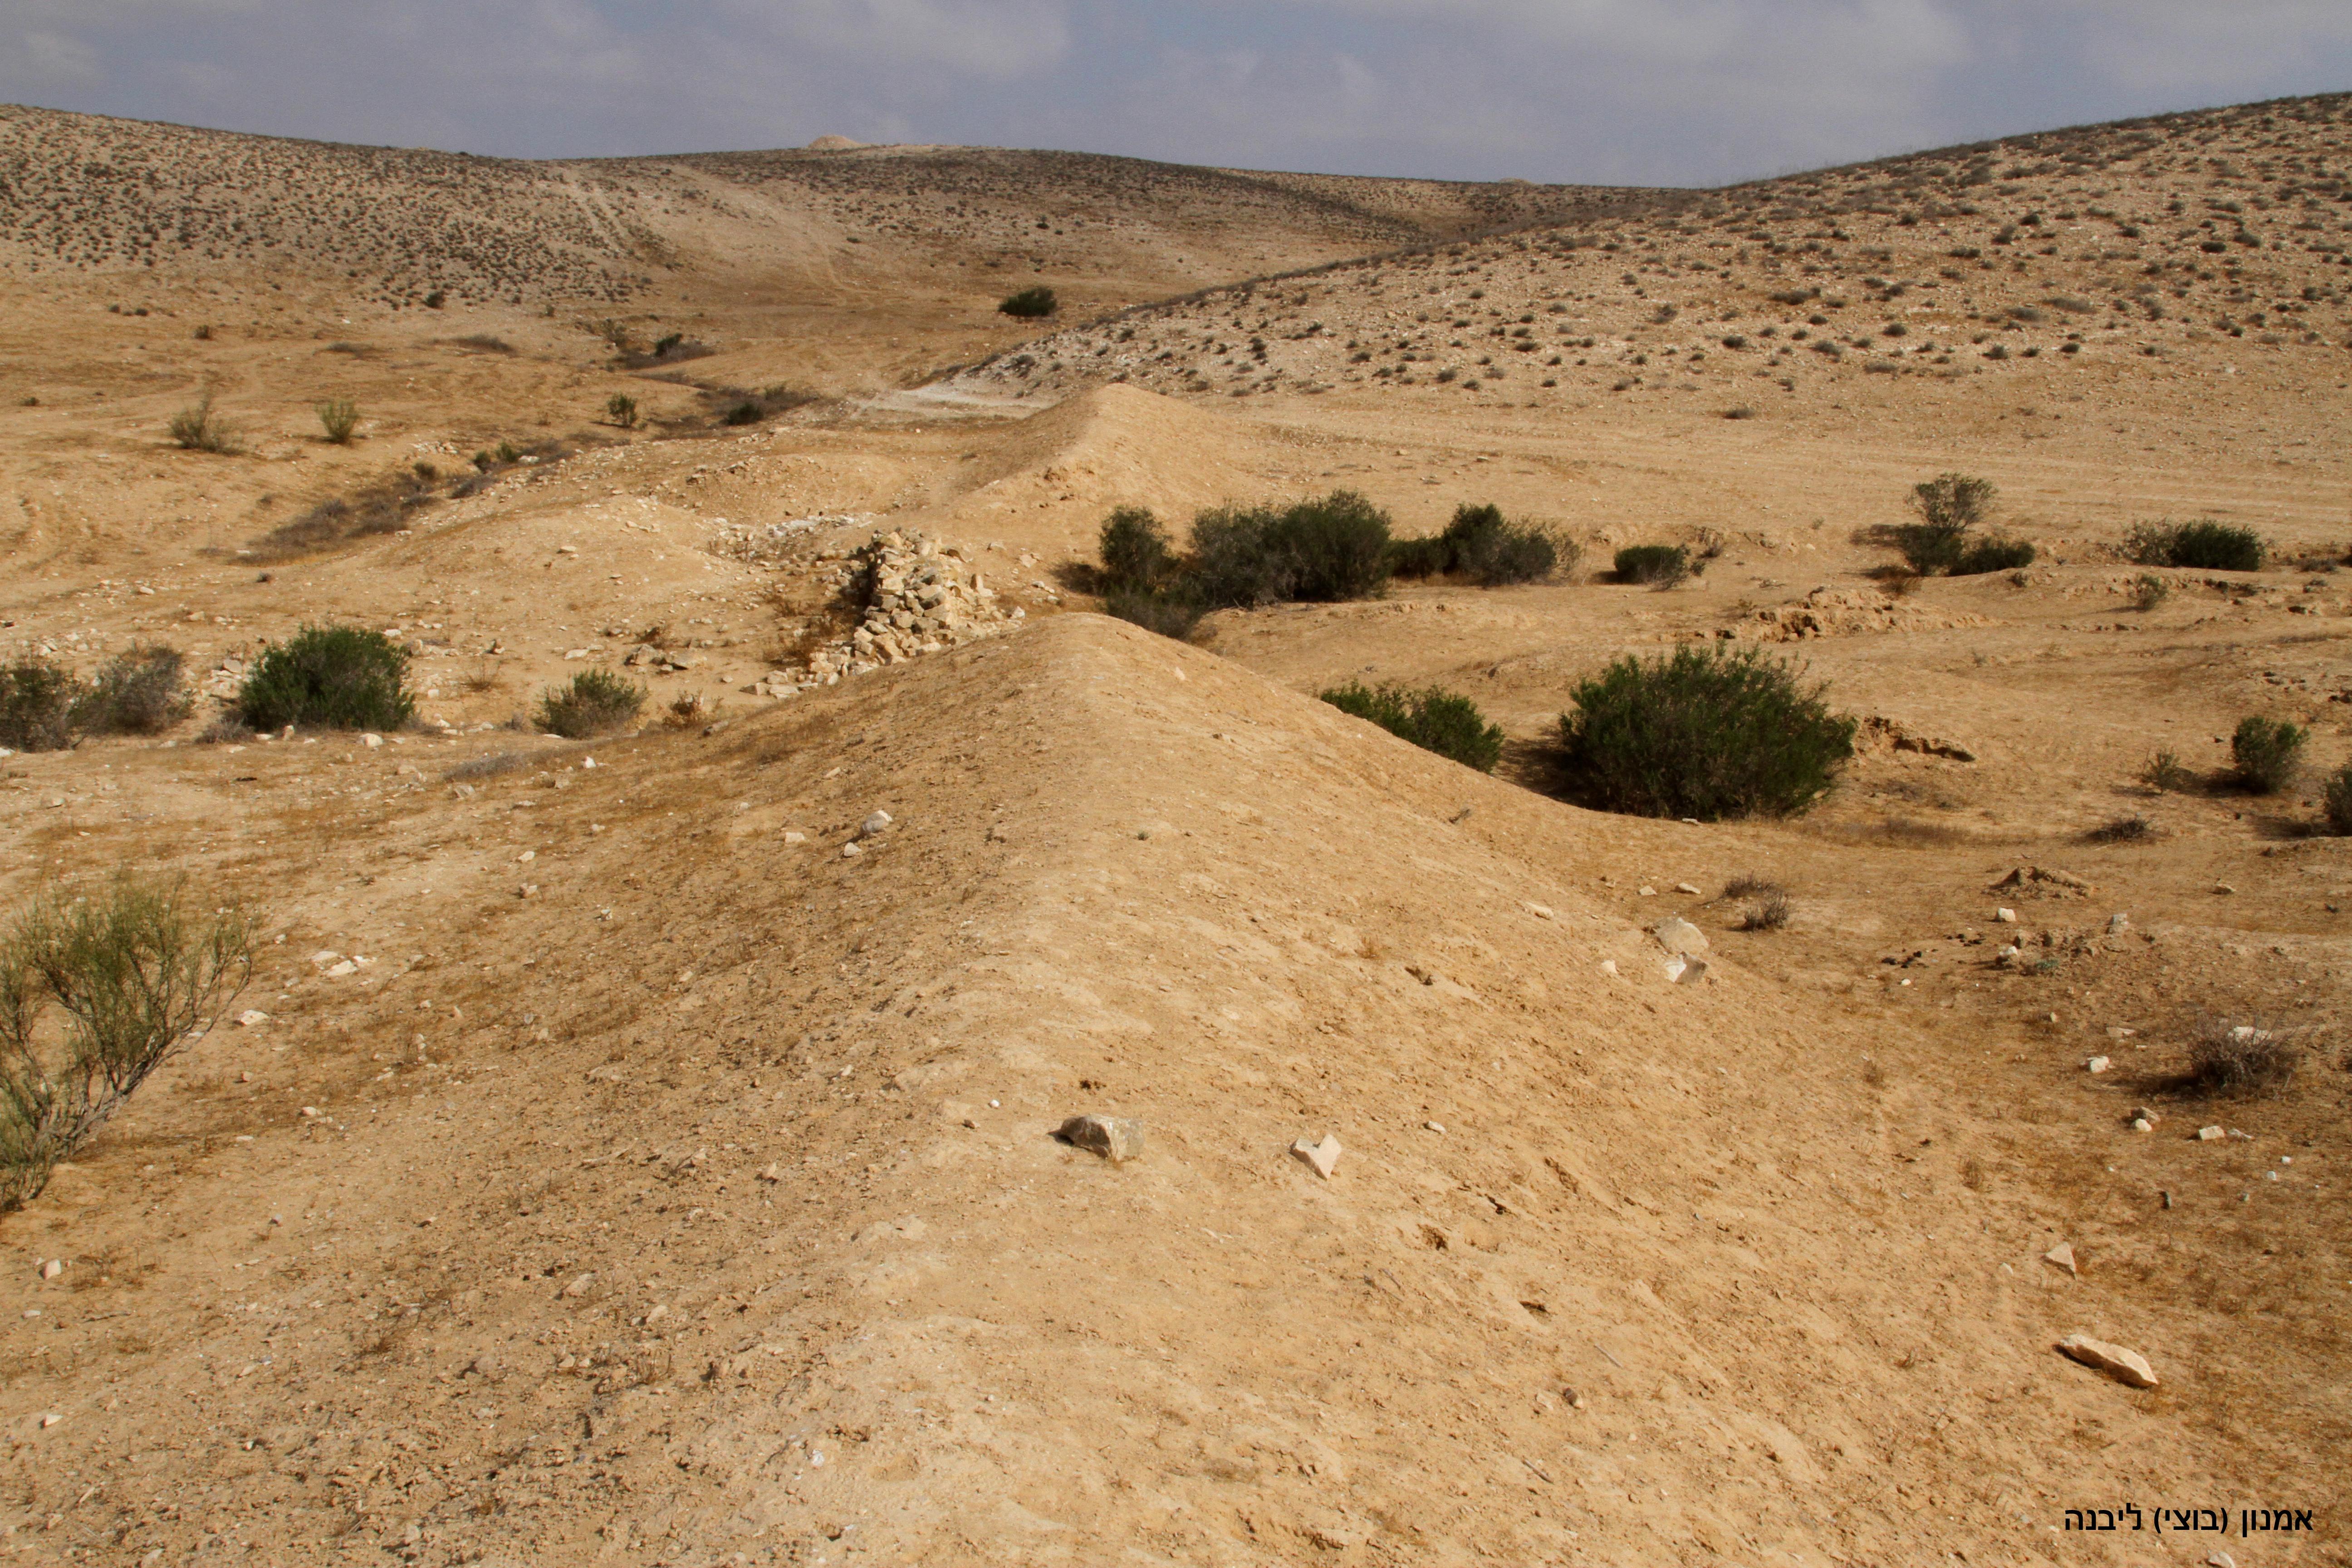 IMG_9651 קדום סכר בנחל חיפושיתעותק